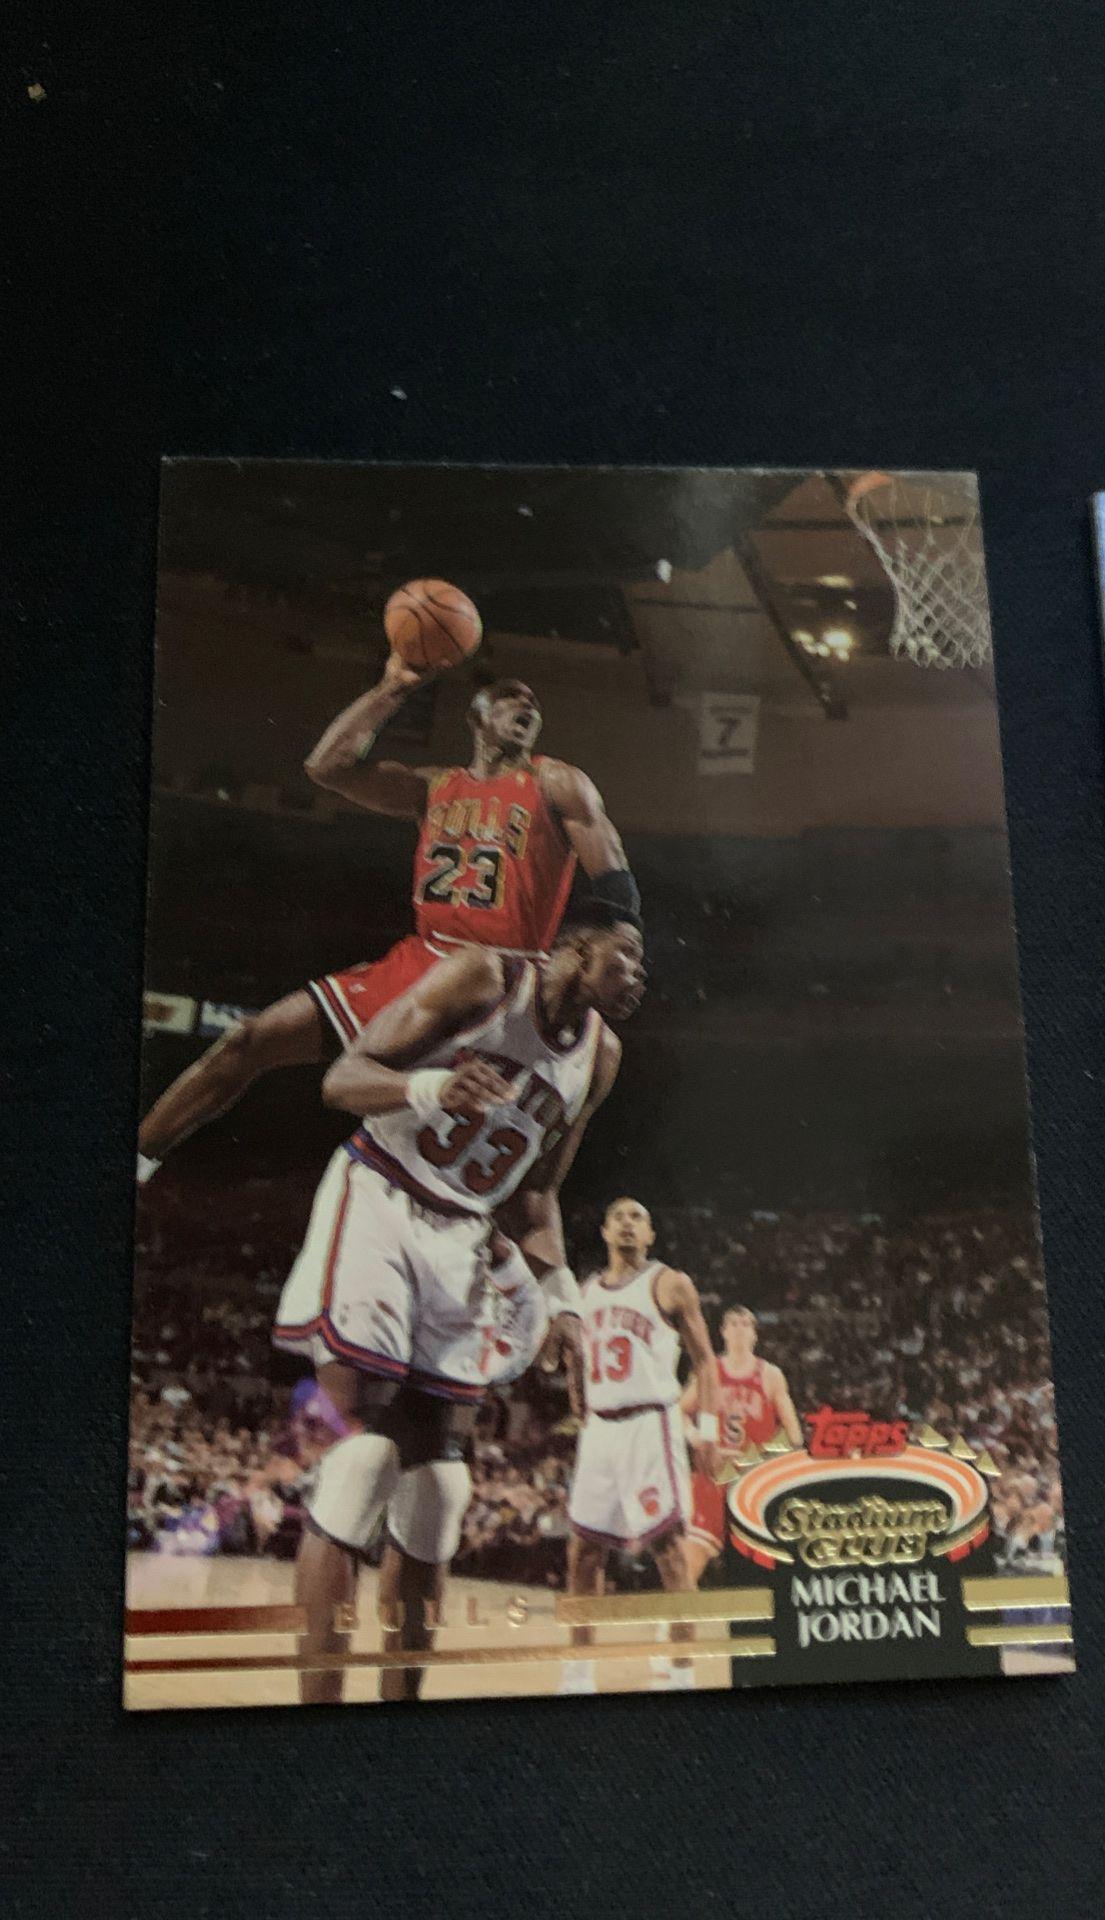 Michael Jordan stadium card+ Richard Jefferson worn shooting shirt card